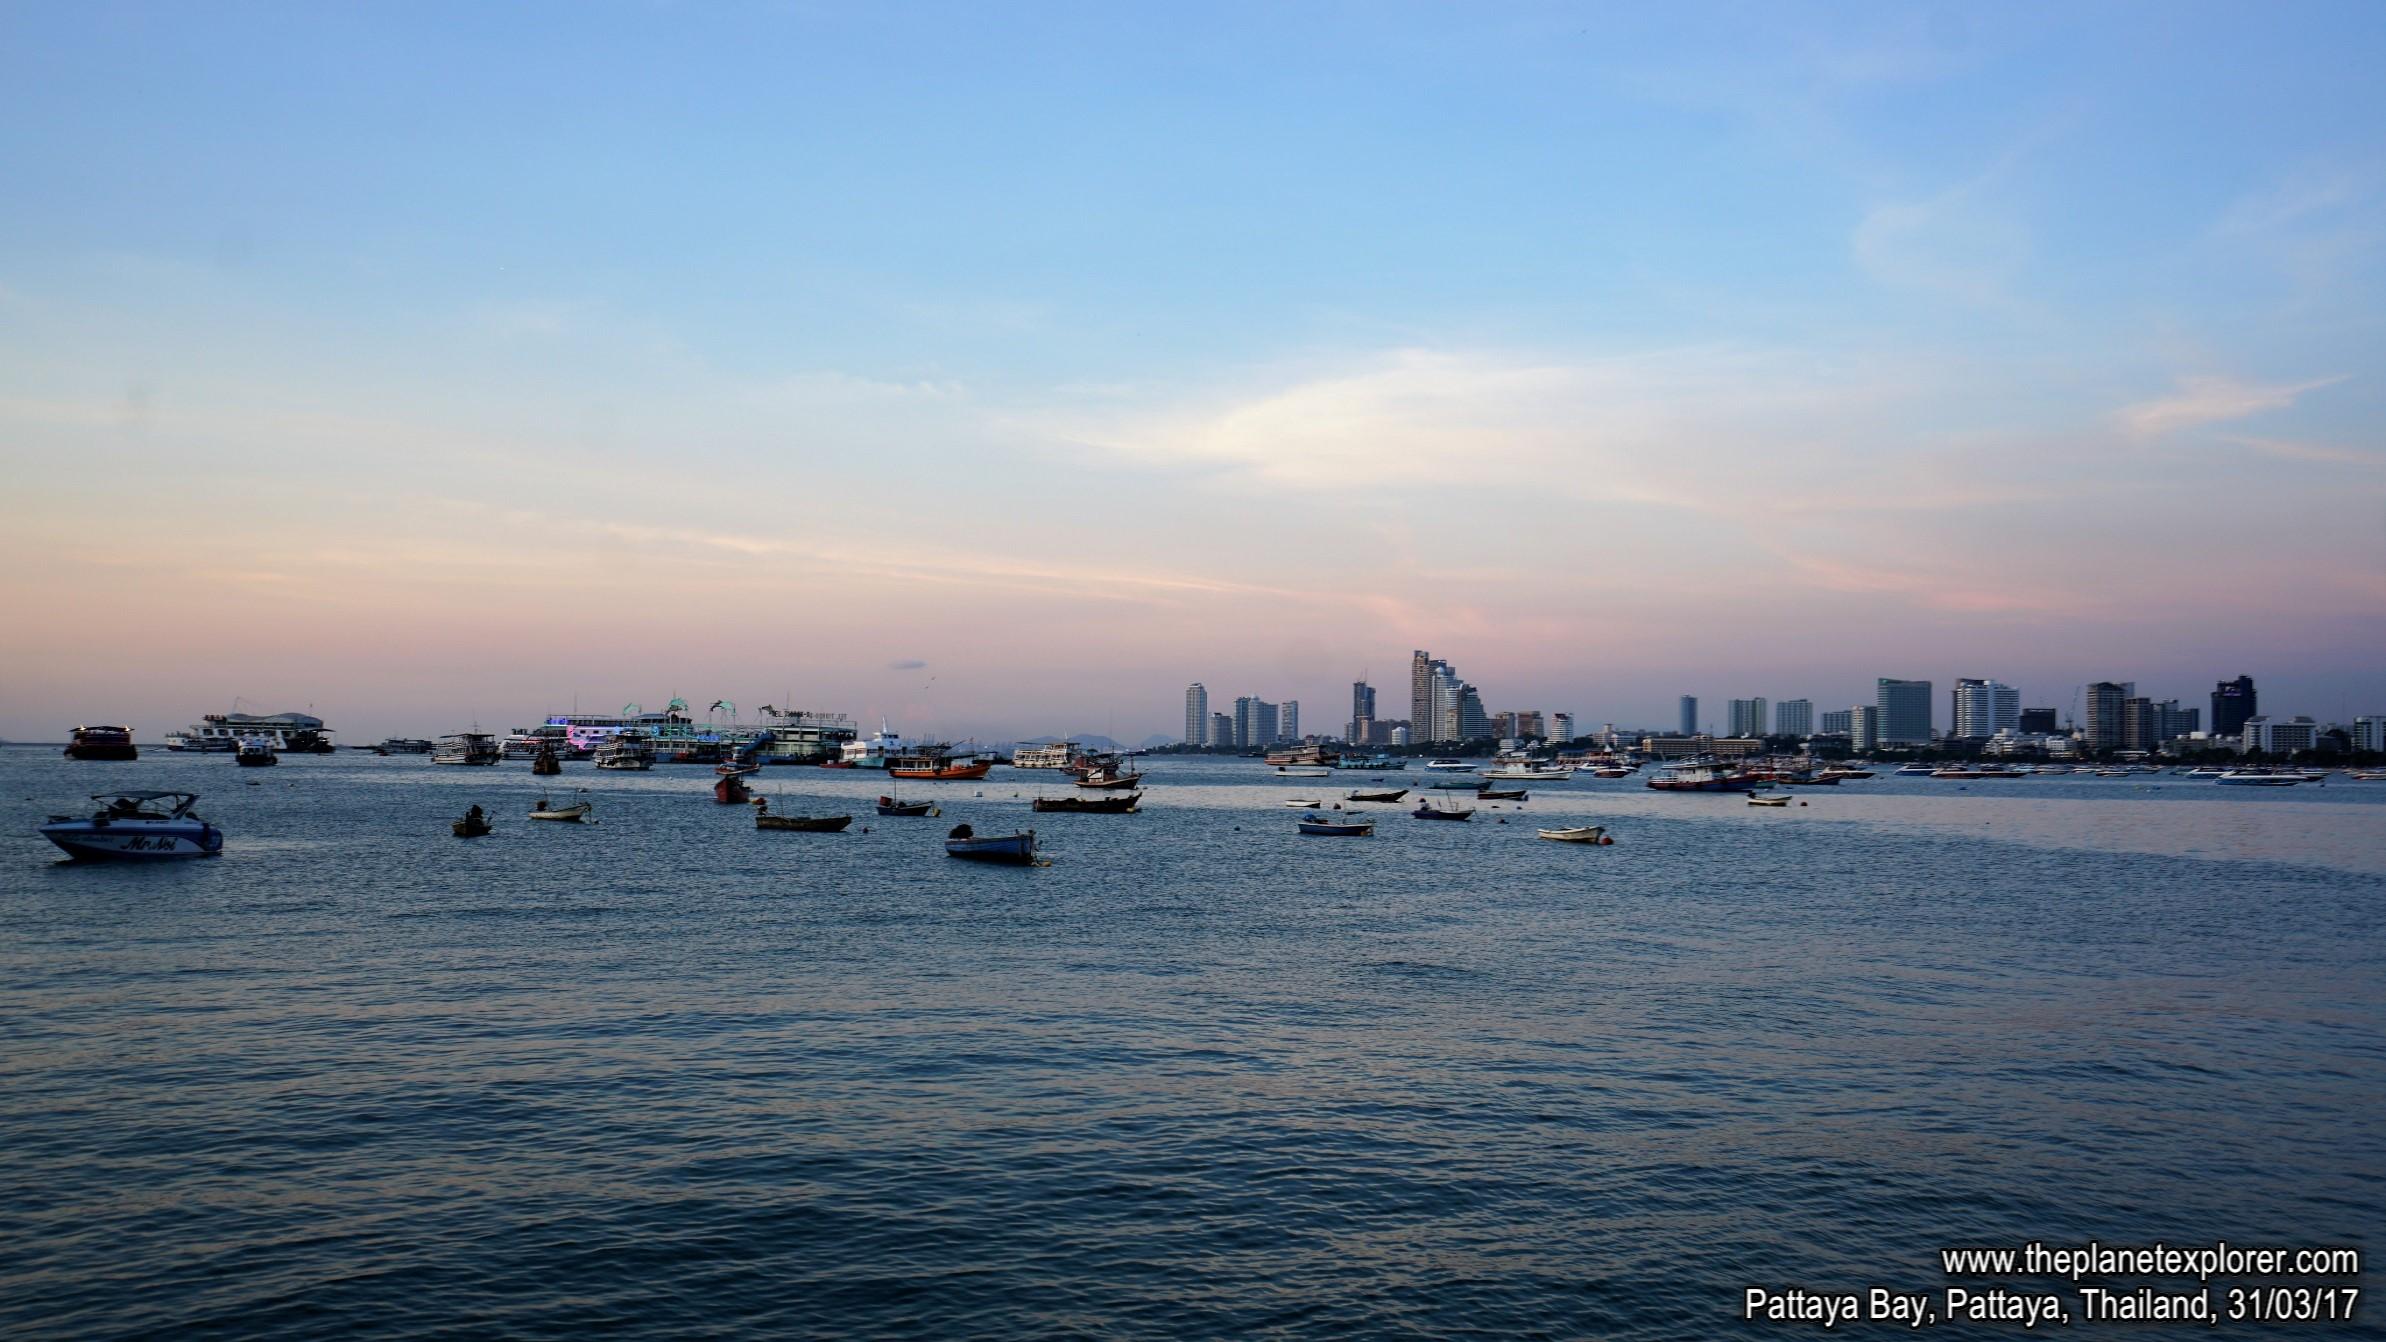 2017-03-31_1821_Thailand_Pattaya_Pattaya Beach_DSC04030_s7R2_LR_@